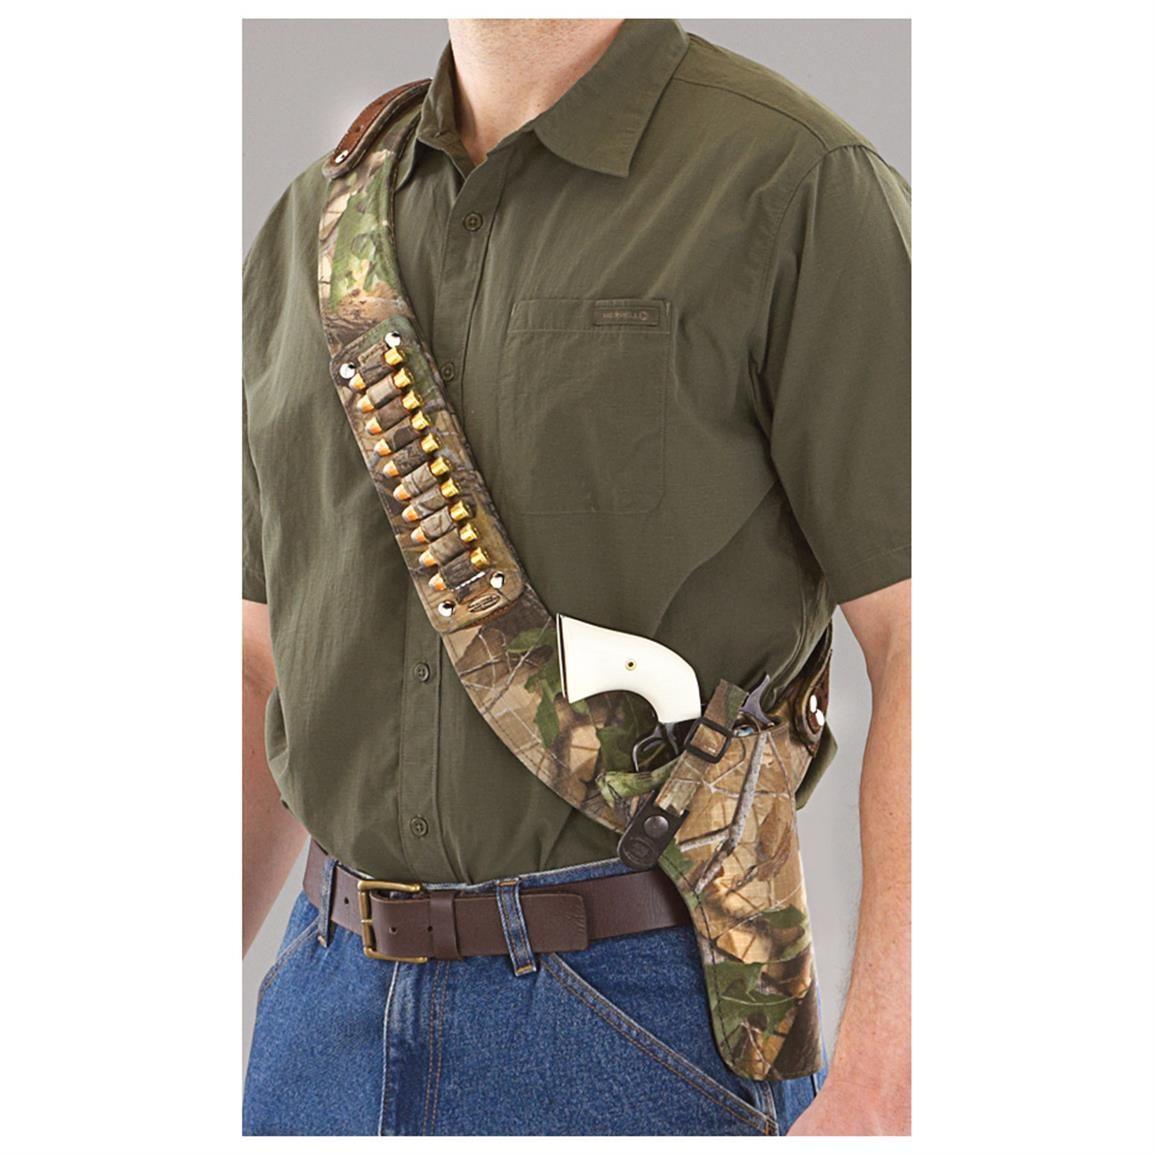 "Right Hand Bandoleer Shoulder CHEST Holster RUGER SECURITY SIX w 4/"" barrel USA"